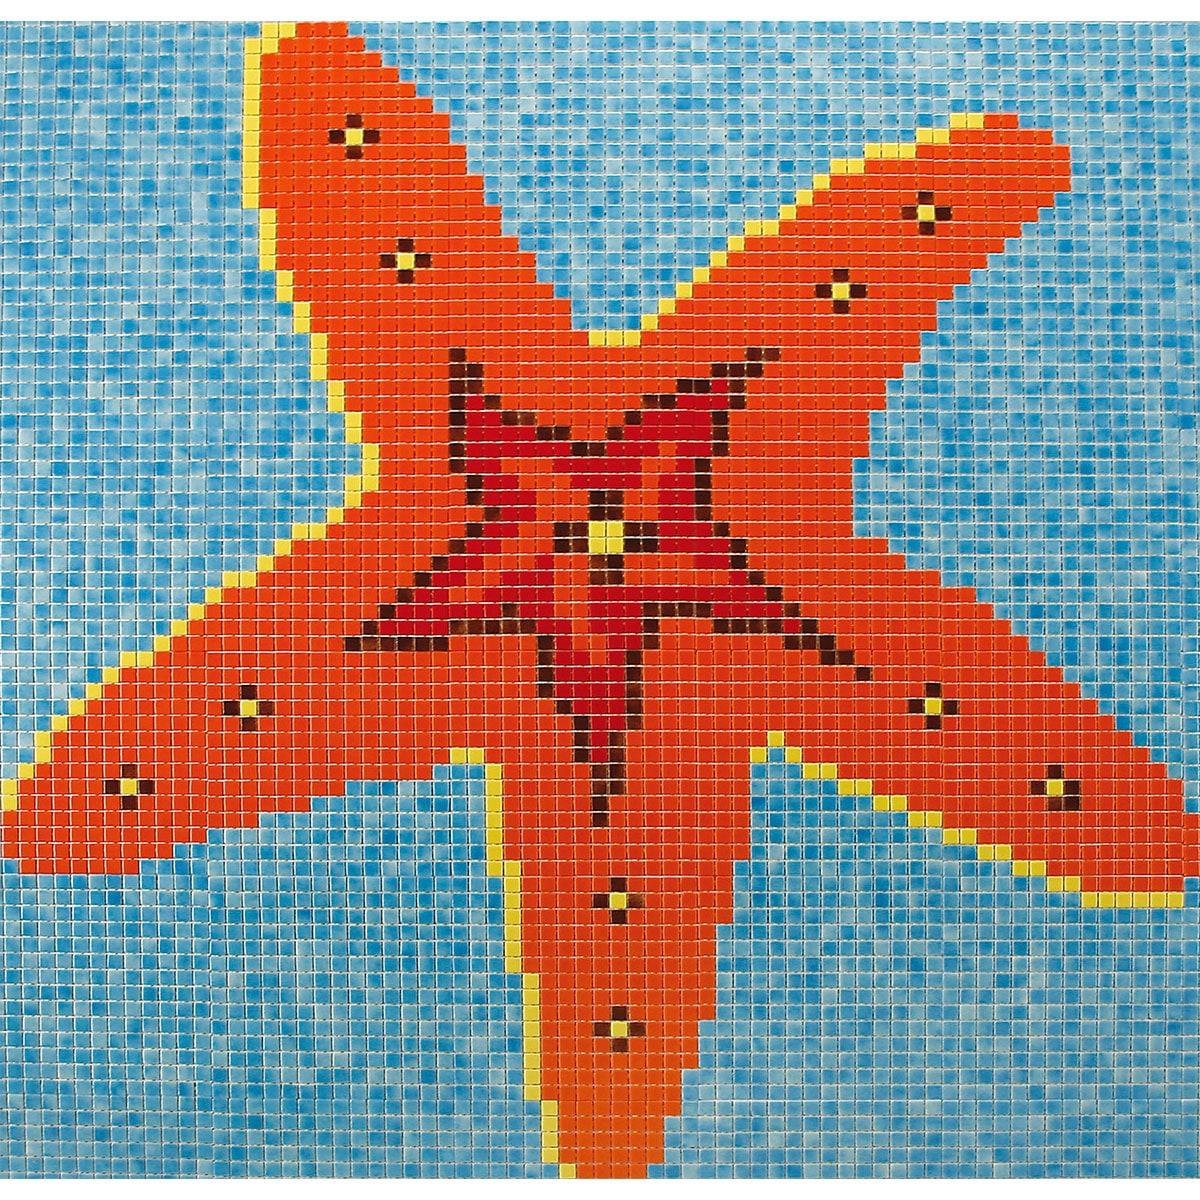 D-26-1,80-x-1,90-m-DIBUJOS-Mosaic-Ezarri.jpg